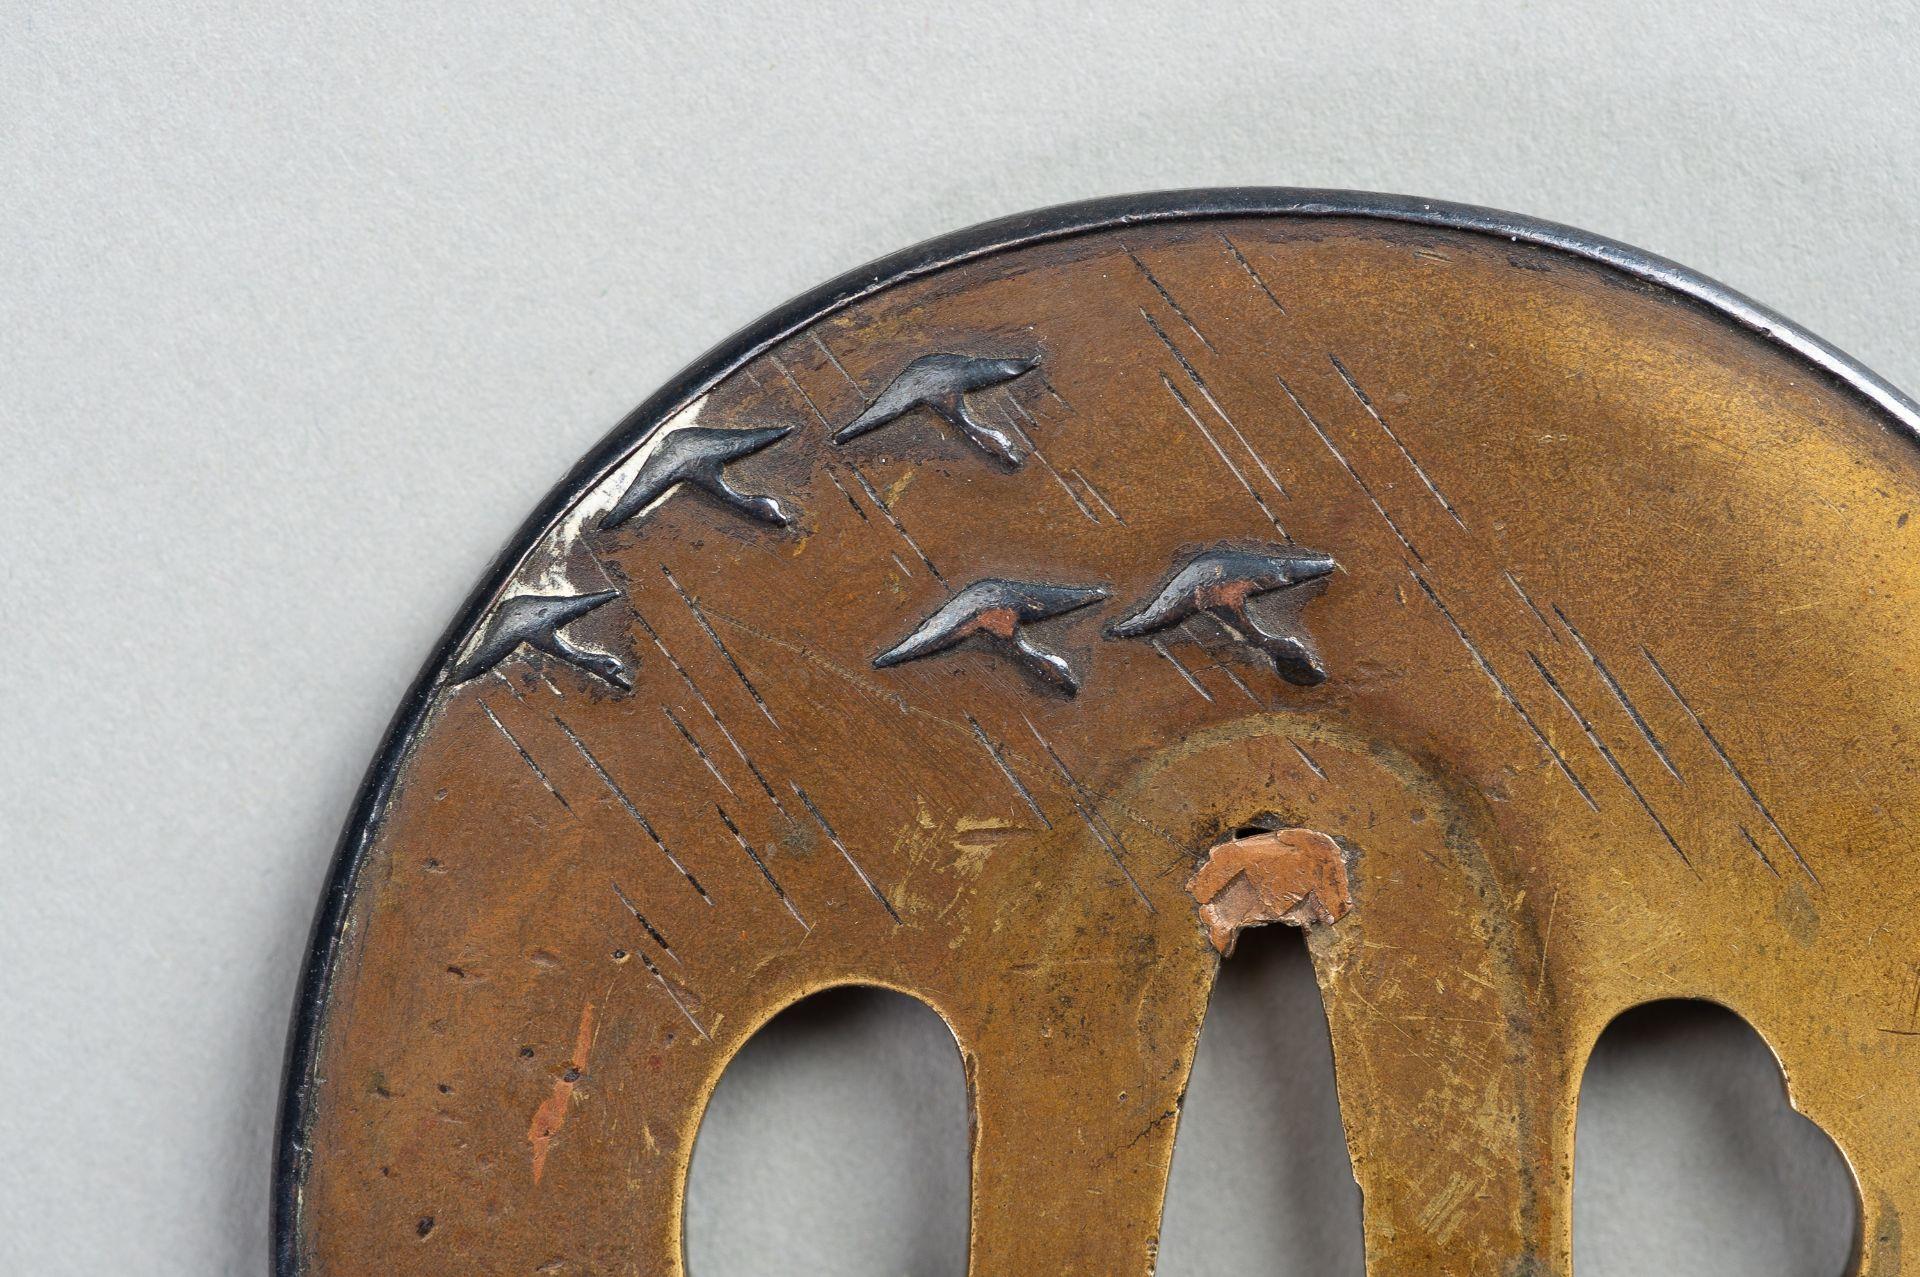 A SENTOKU TSUBA WITH A LANDSCAPE - Image 4 of 5